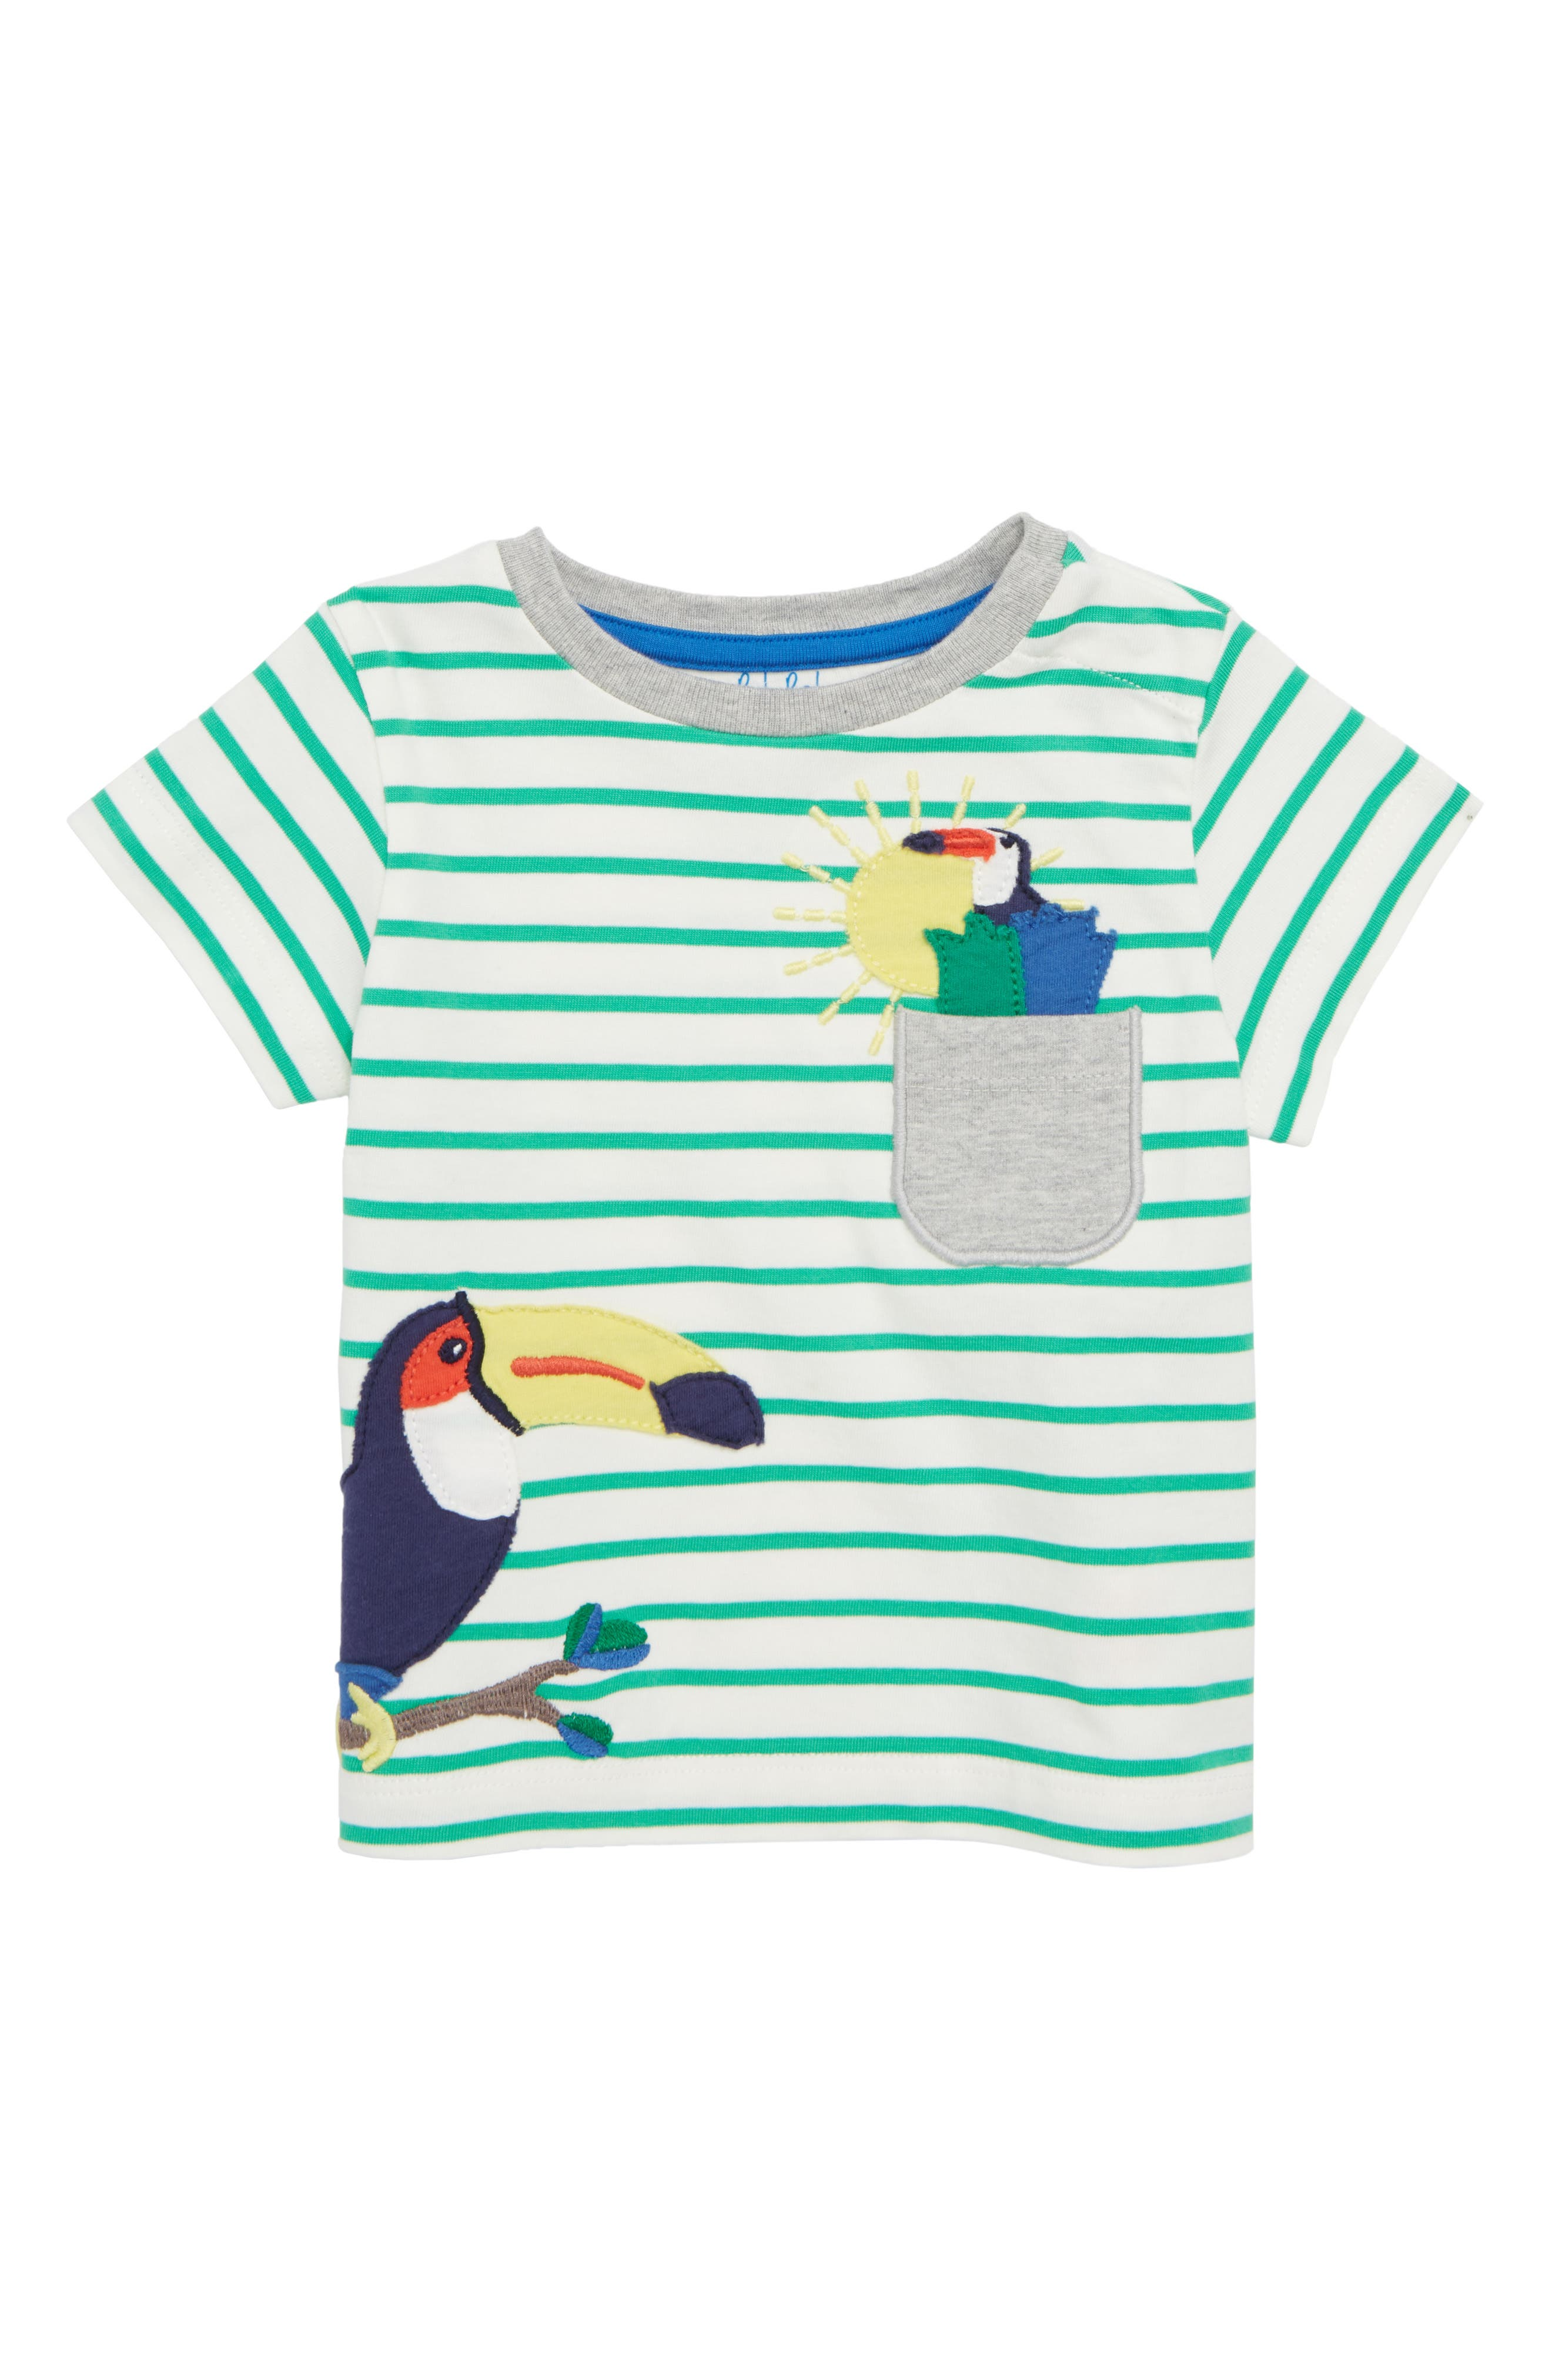 Pocket Friends T-Shirt,                             Main thumbnail 1, color,                             Astro Green